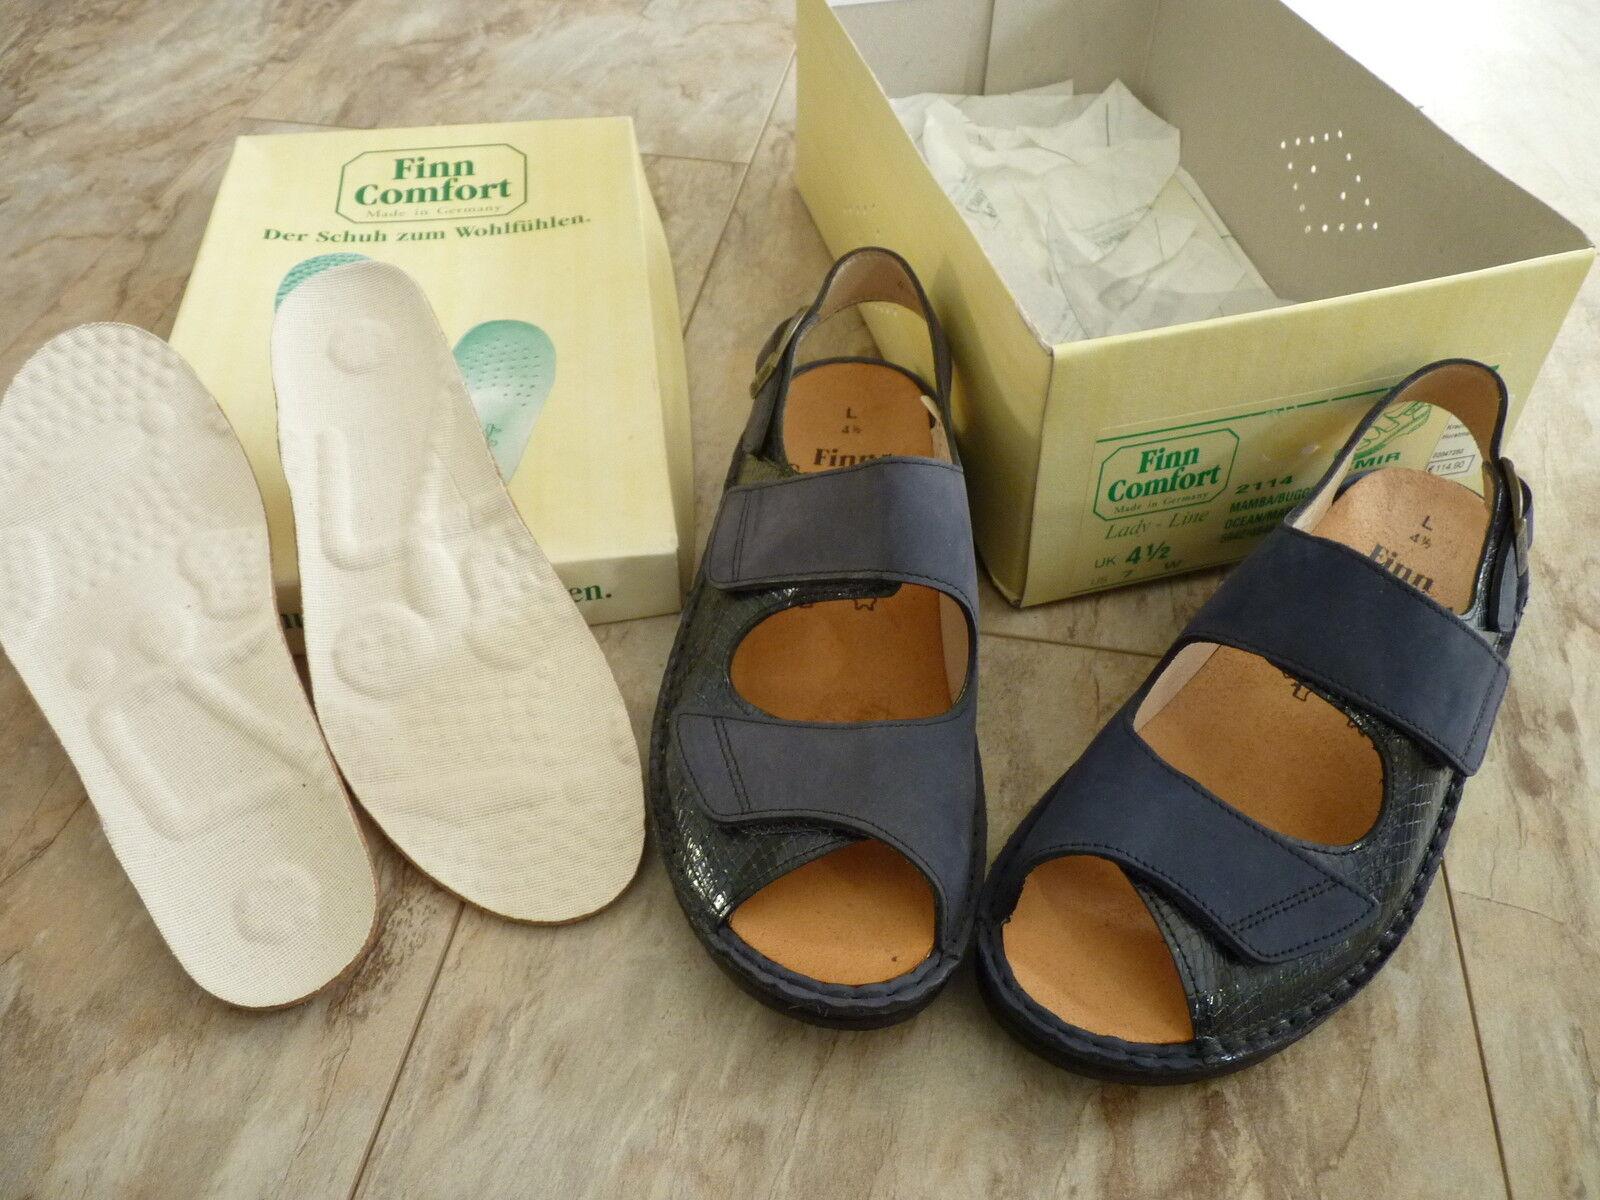 Finn Comfort izmir verano SEÑORA zapatos sandalias velcro depósitos /37,5 nuevo